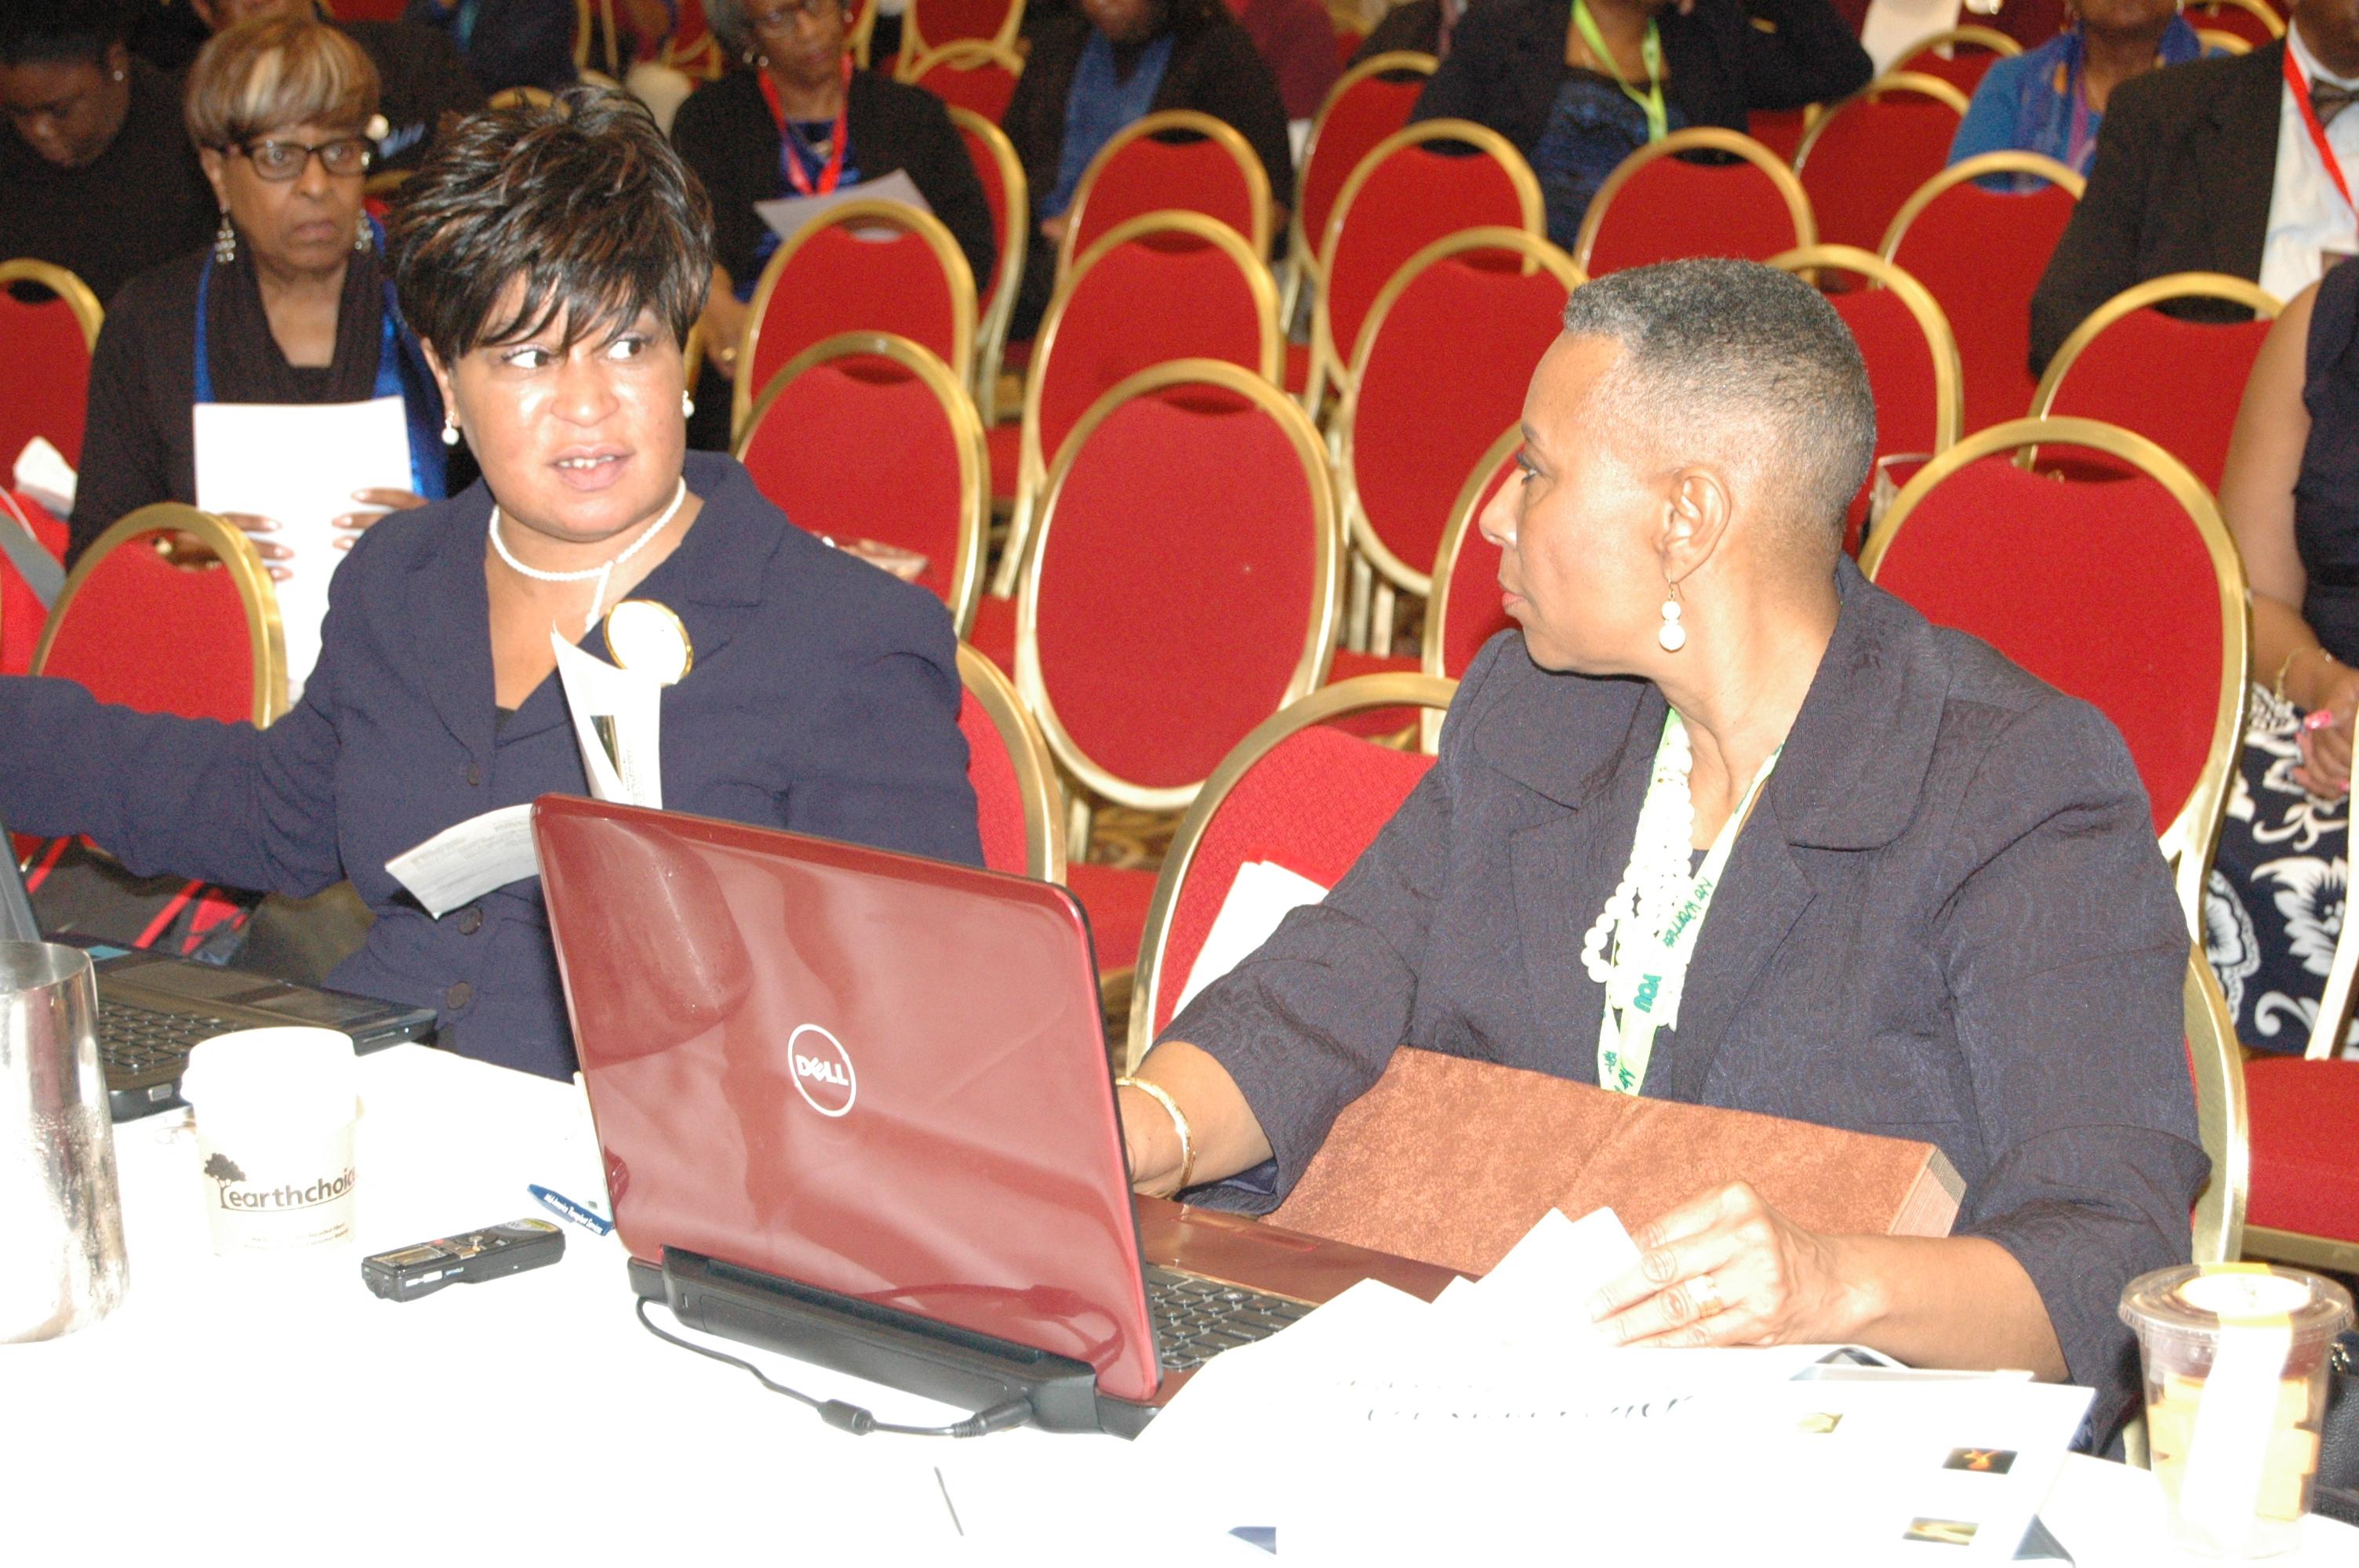 conference2/DSC0280.JPG